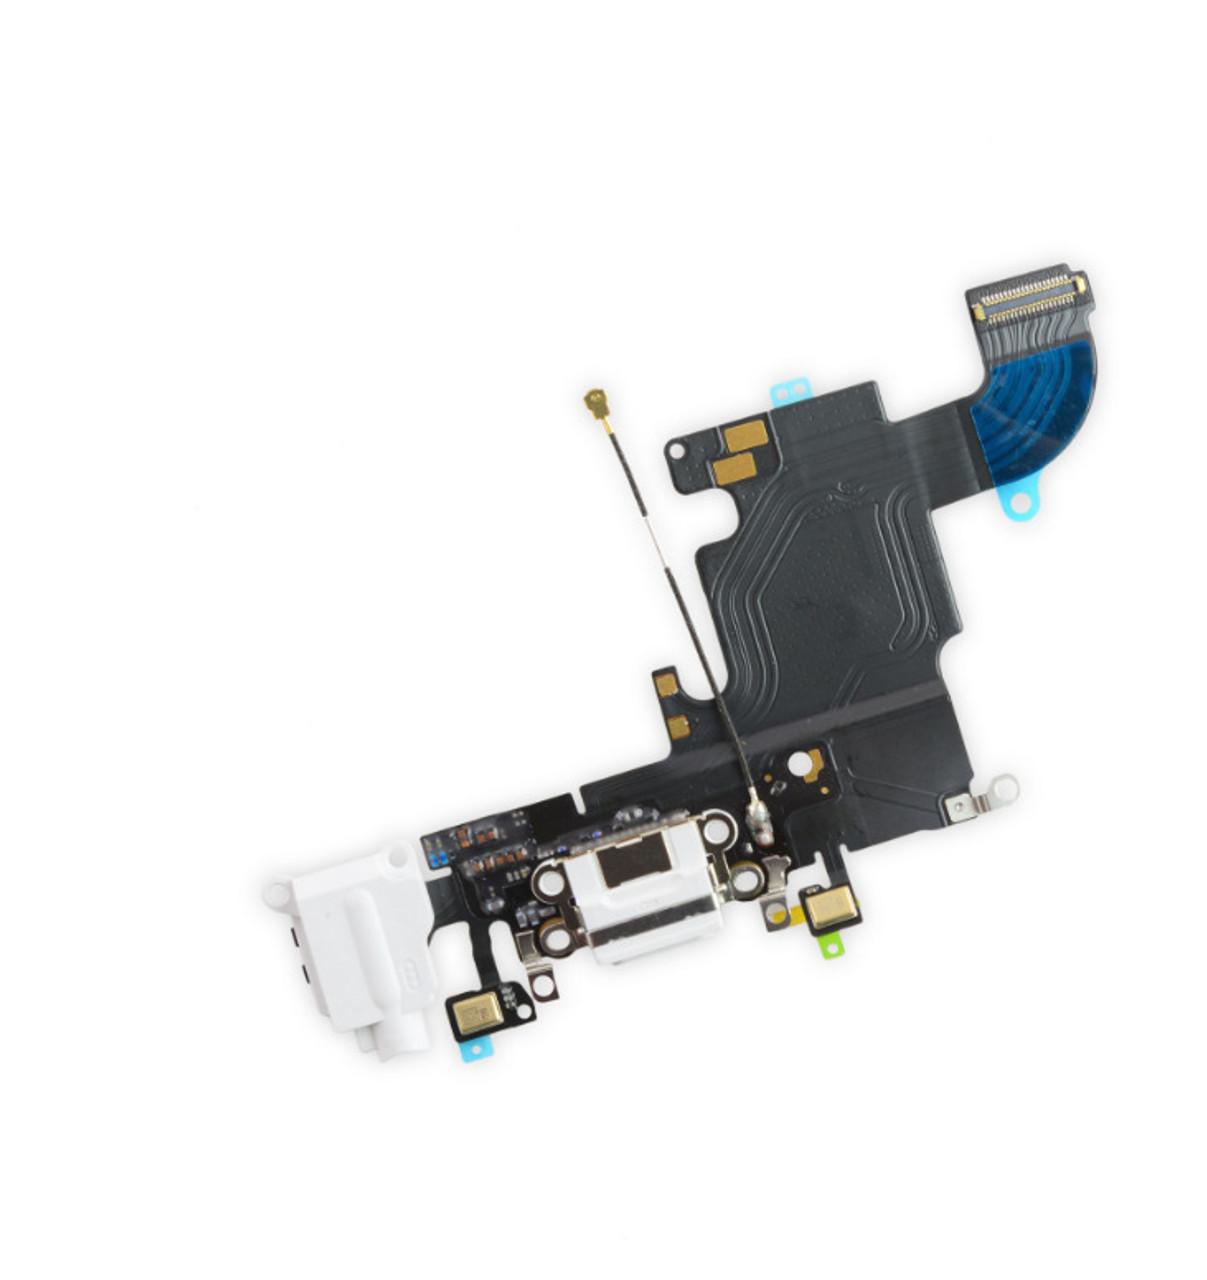 OEM SPEC White Charging Port Headphone Jack Mic Audio Flex Cable For iPhone 6S